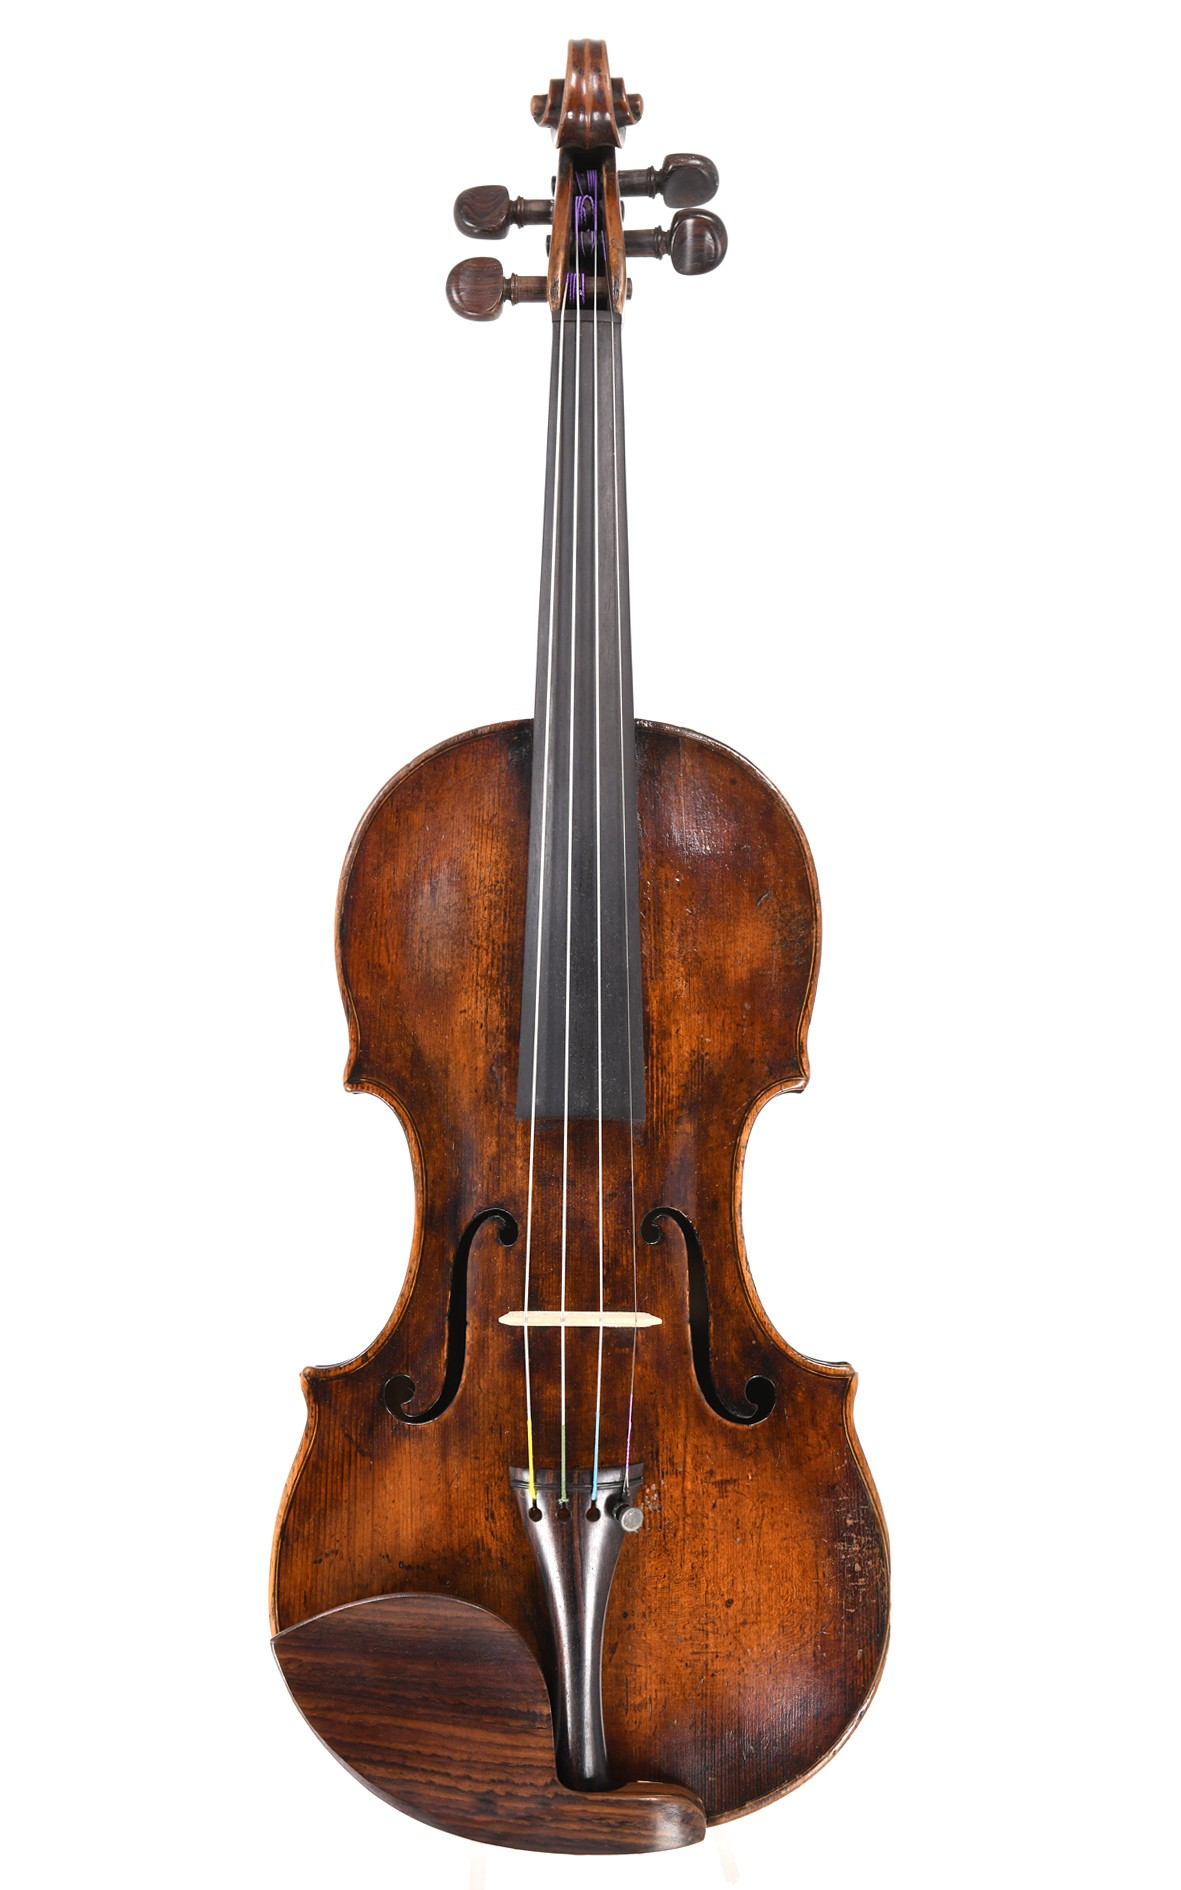 Interesting English master violin, circa 1800